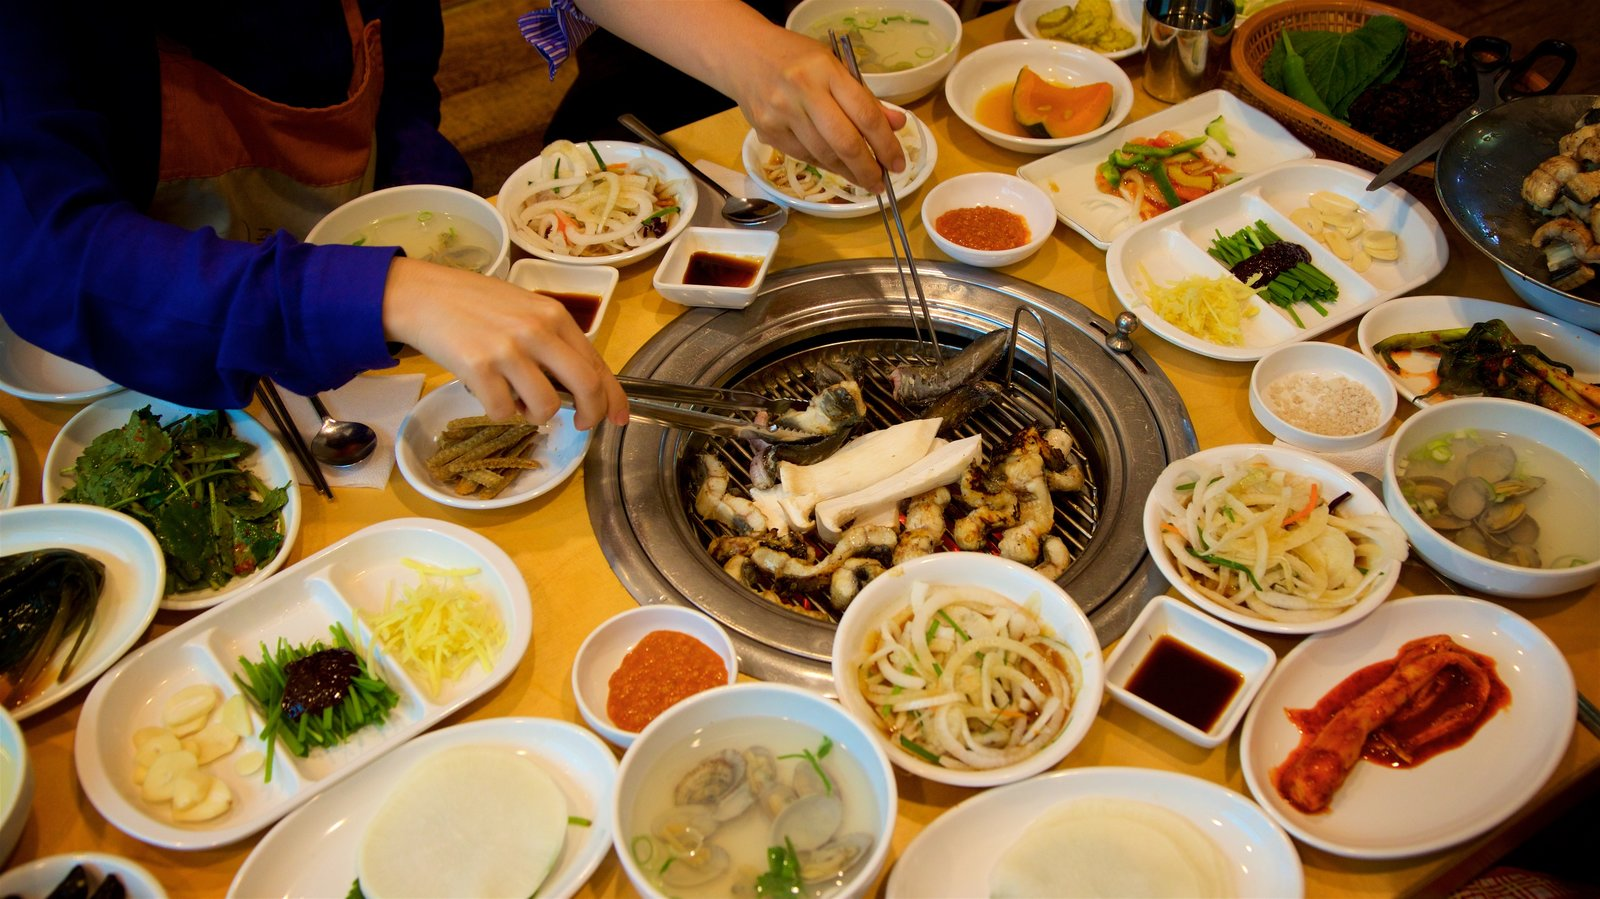 Incheon featuring food